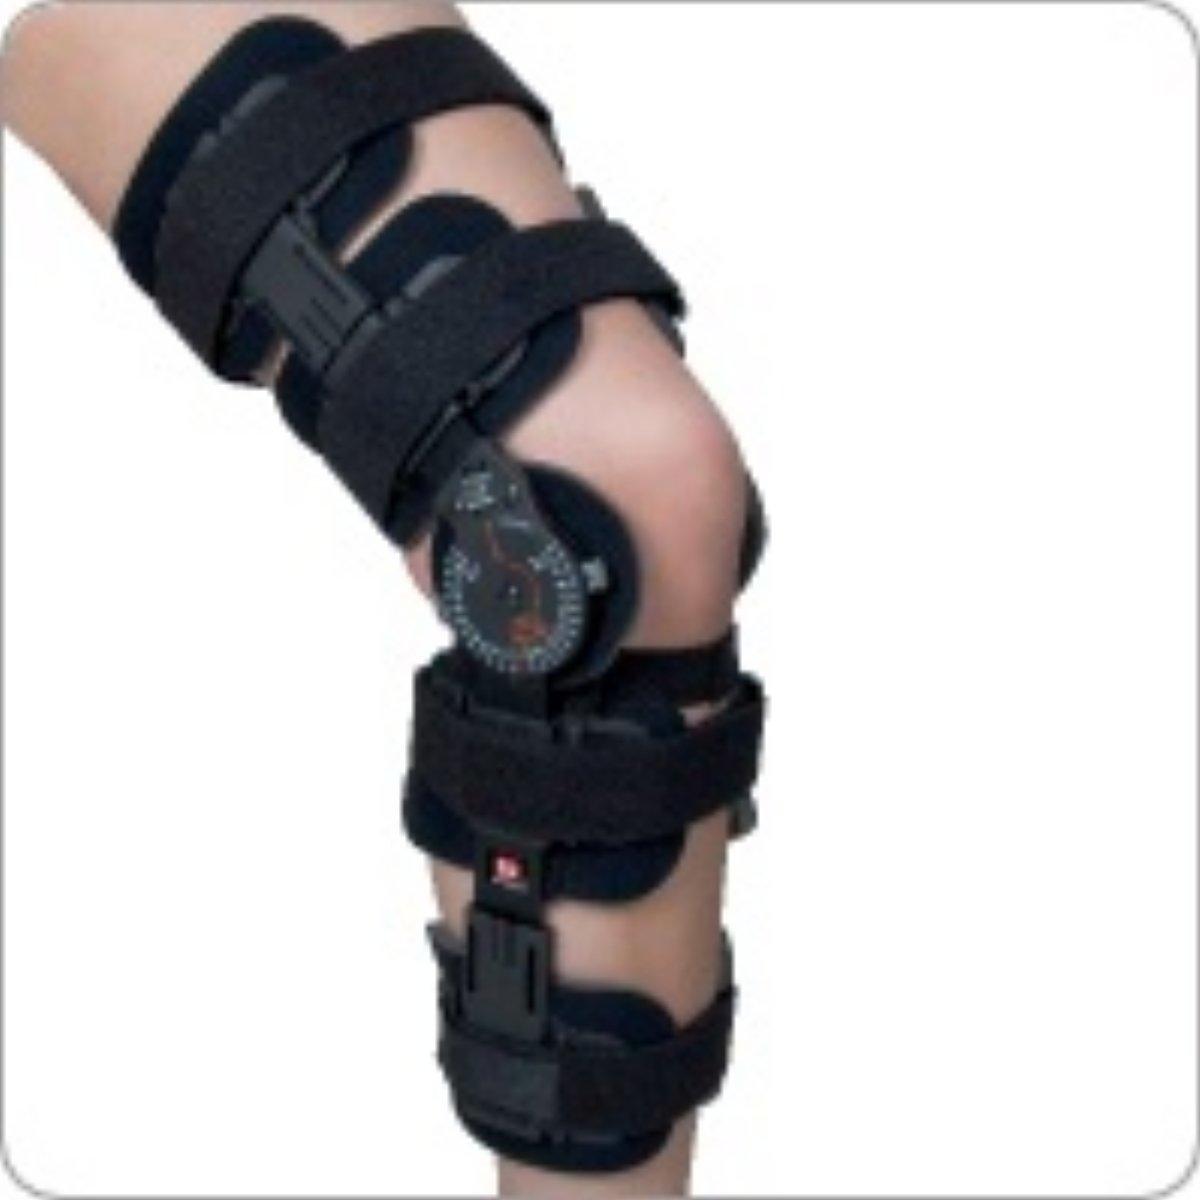 Revolution 3 Post Op Hinged Knee Brace, Front Closure Long